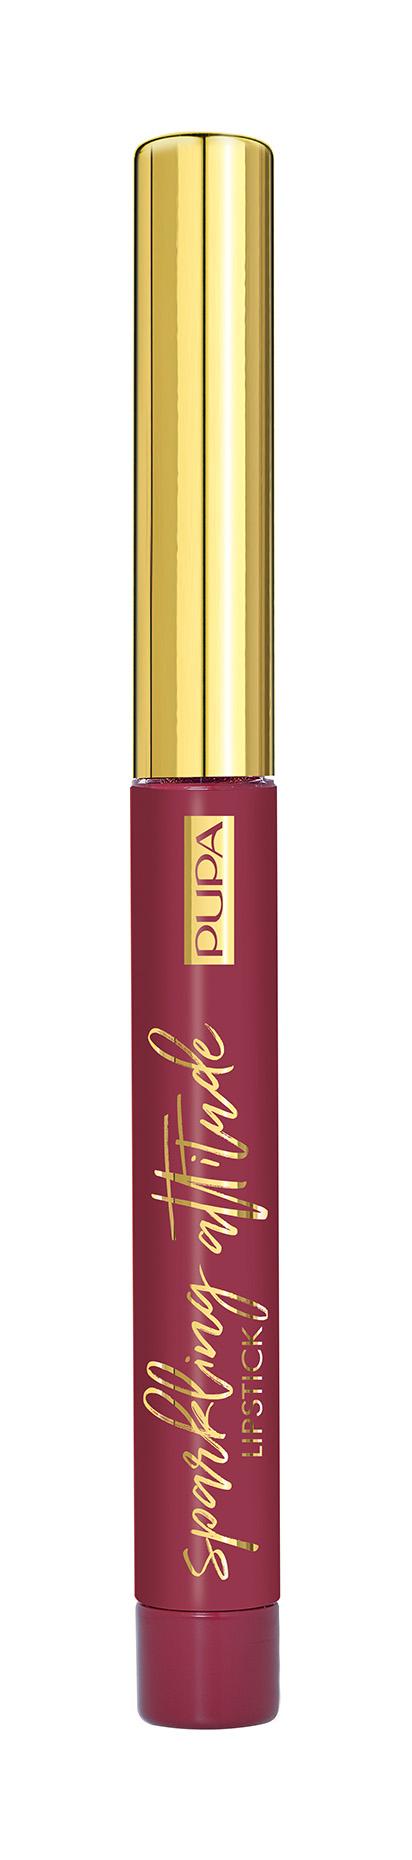 Купить Помада PUPA Sparkling Attitude Matt Effect Lipstick